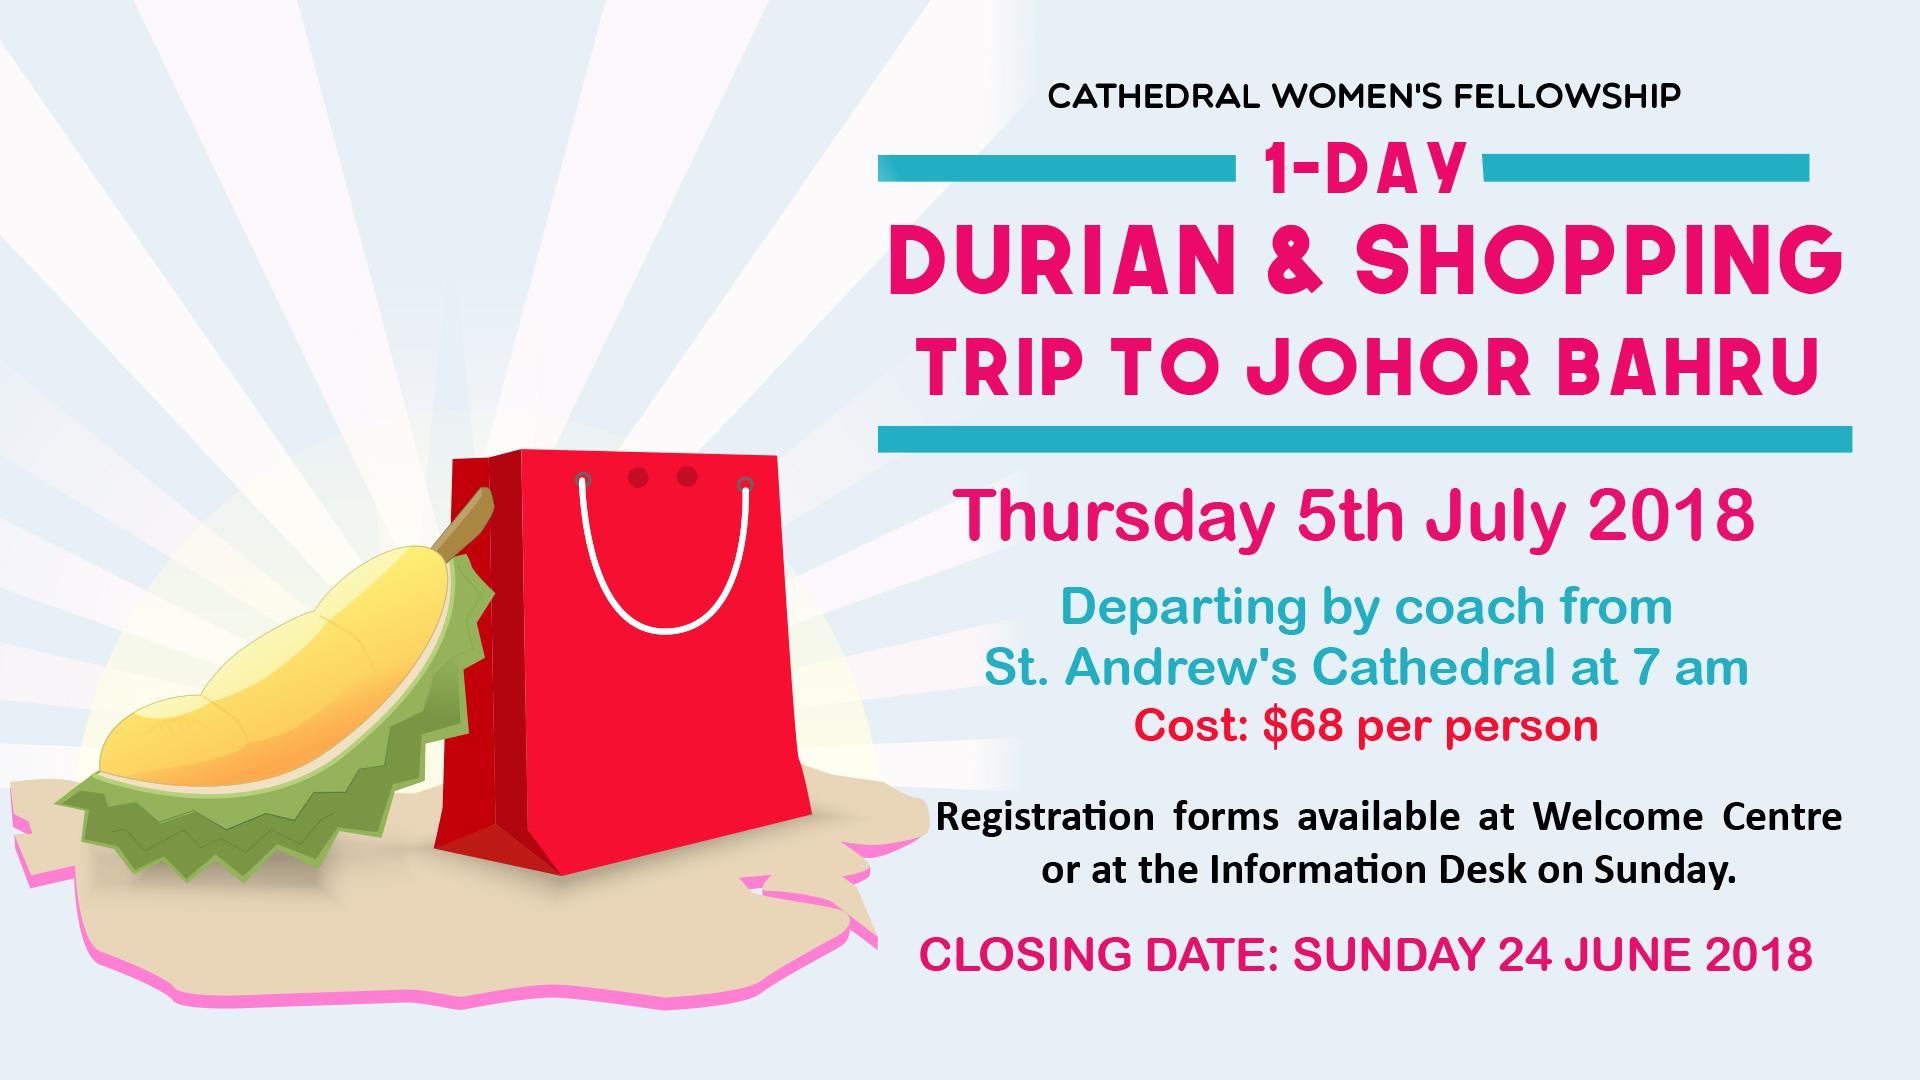 1-Day Durian & Shopping Trip To Johor Bahru